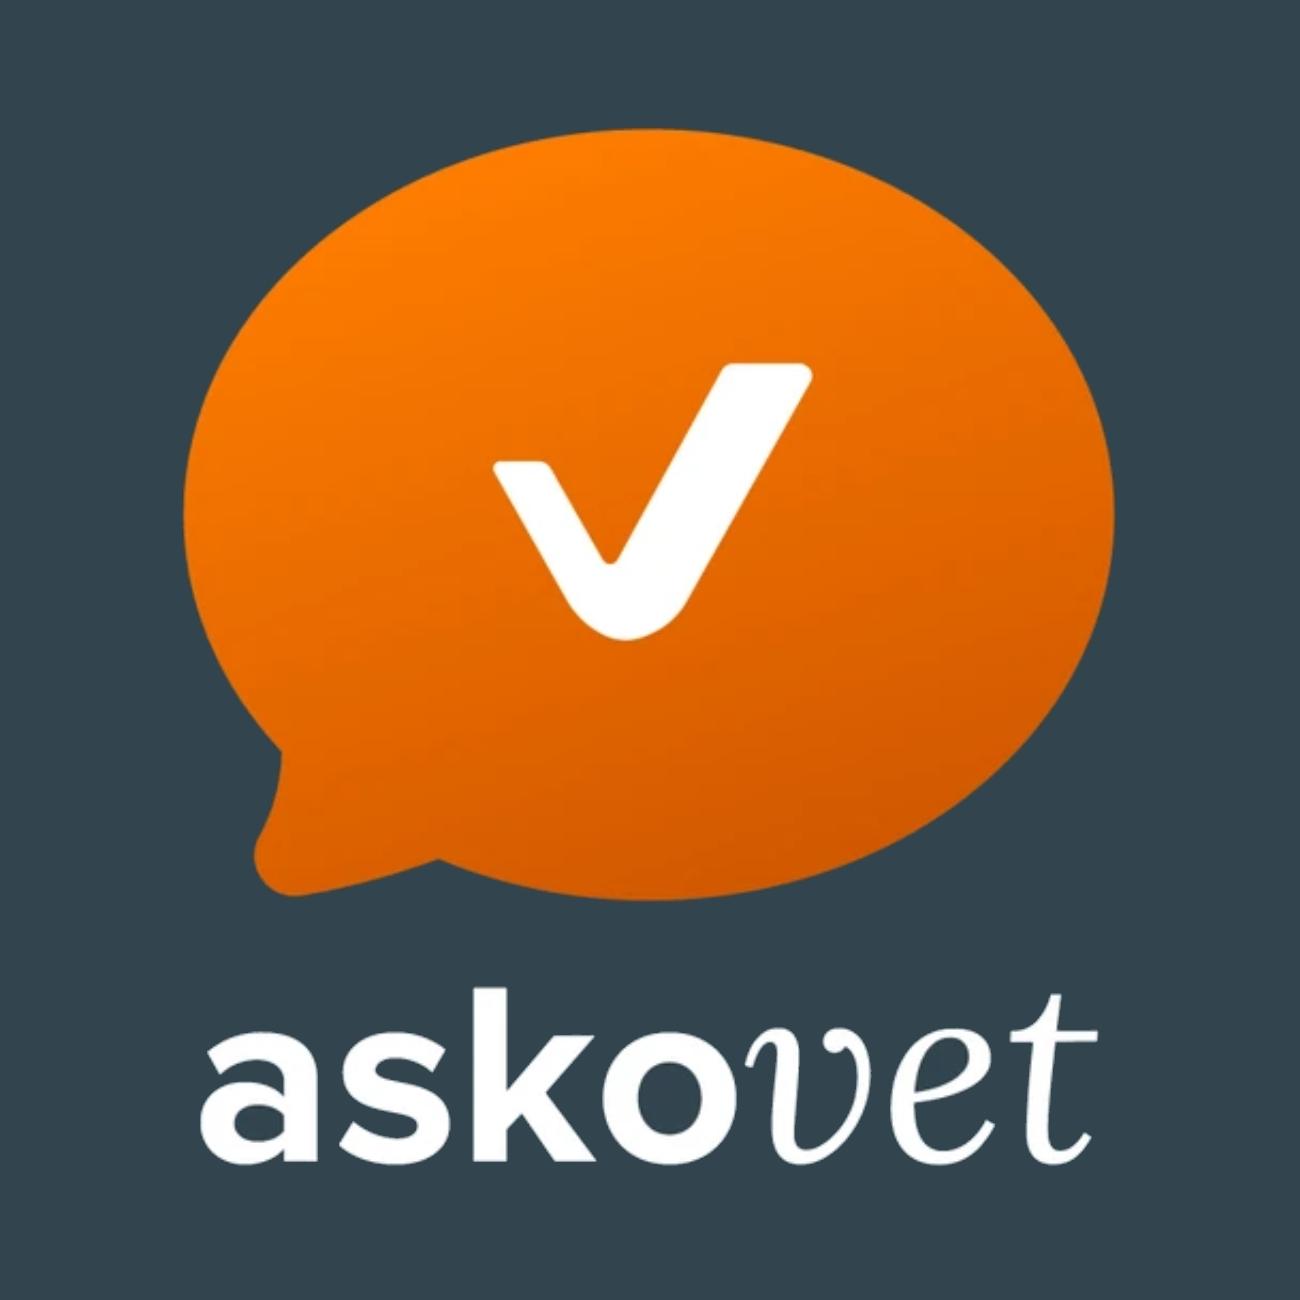 Askovet